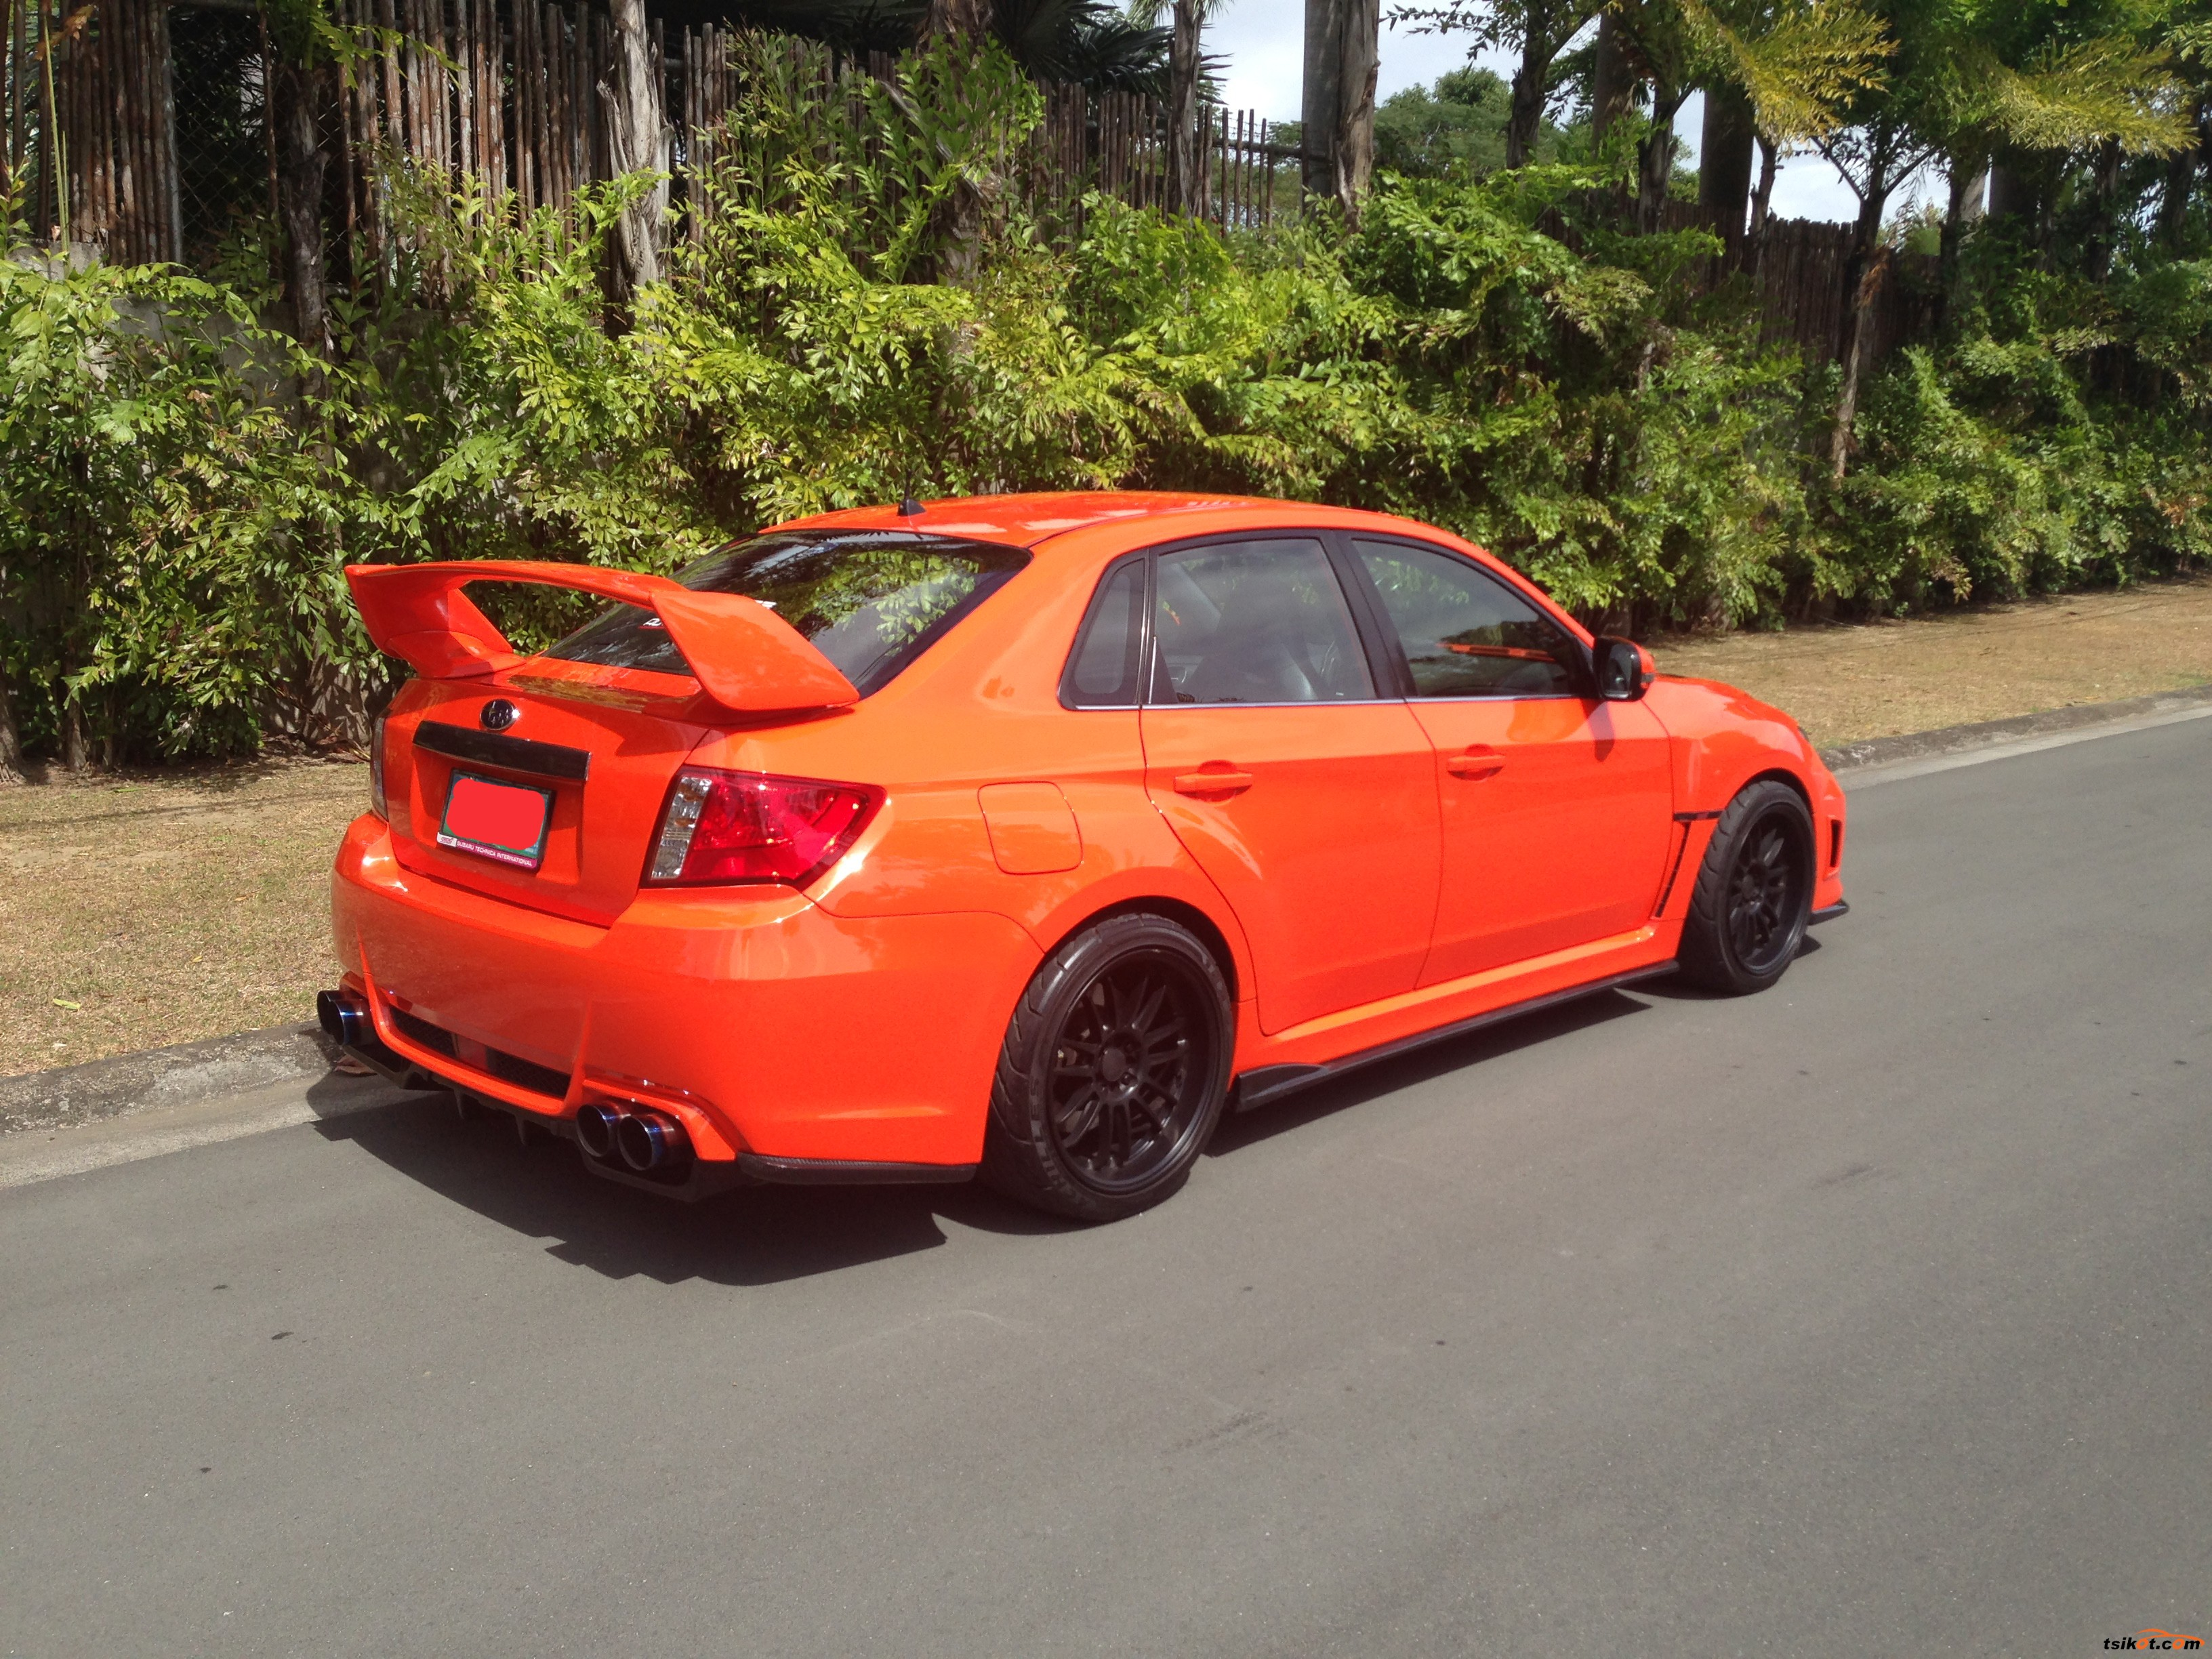 Subaru Impreza Wrx 2011 - 4